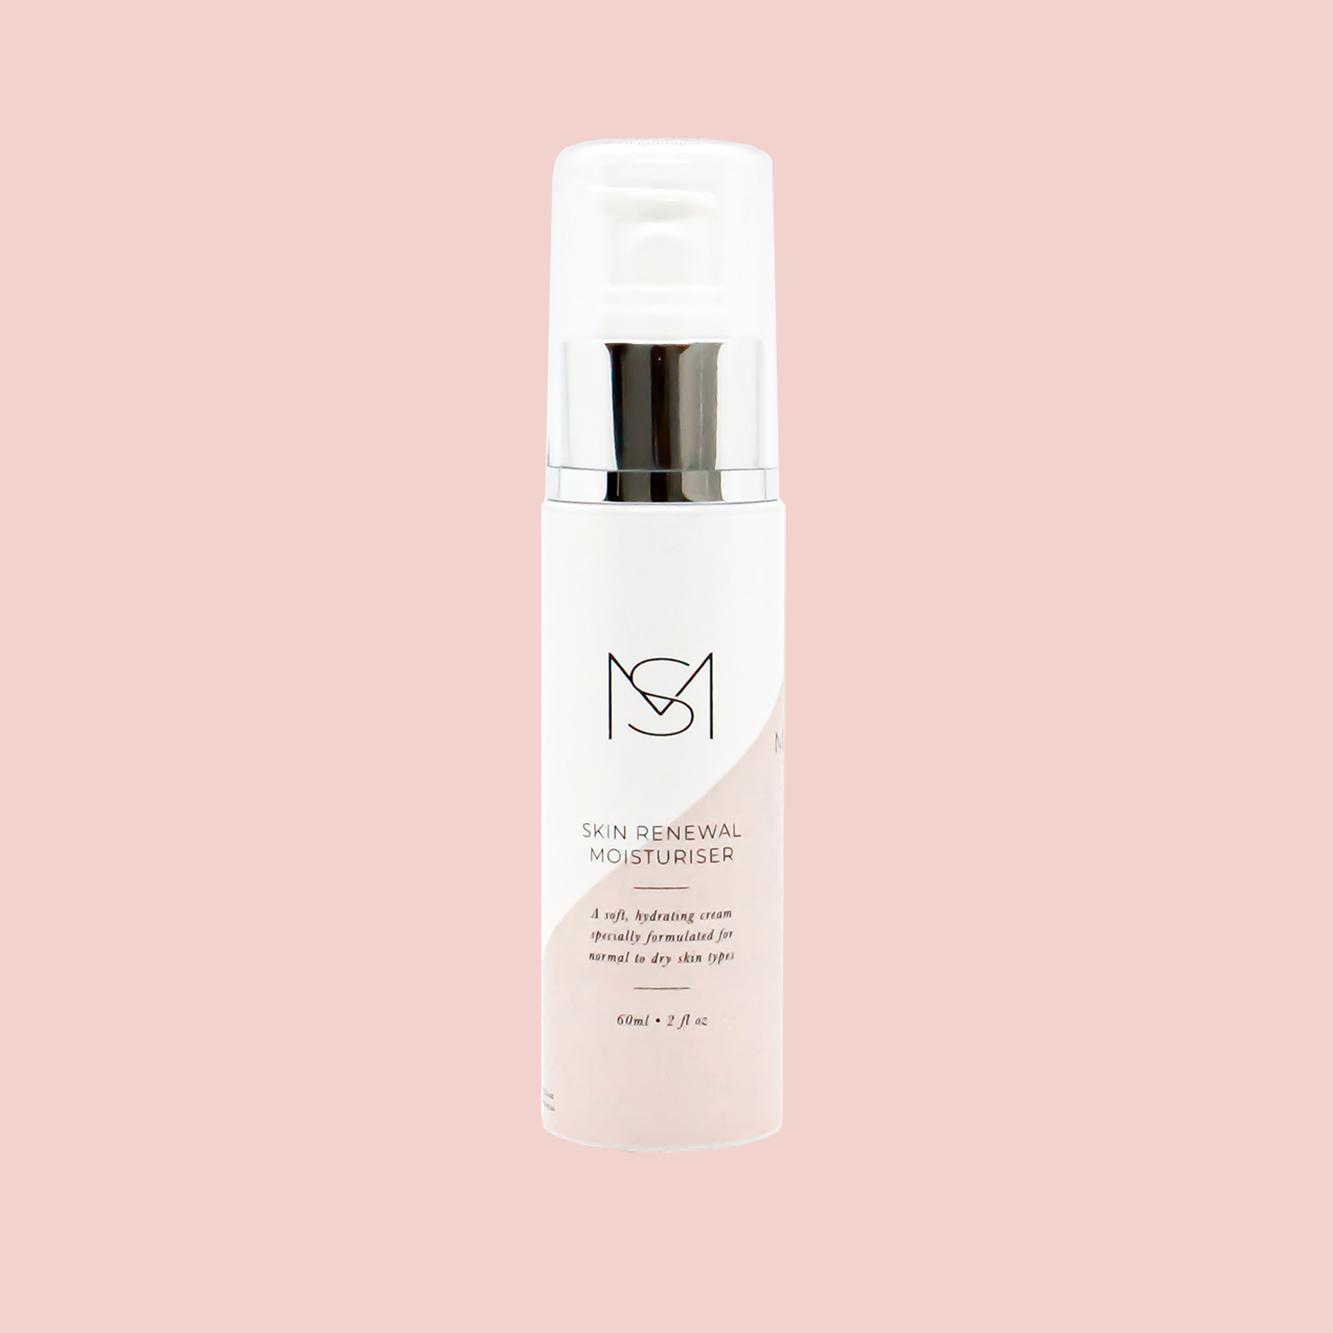 Skin Renewal Moisturiser 60mL - Australian made skincare by Mariella Skin Perth 01